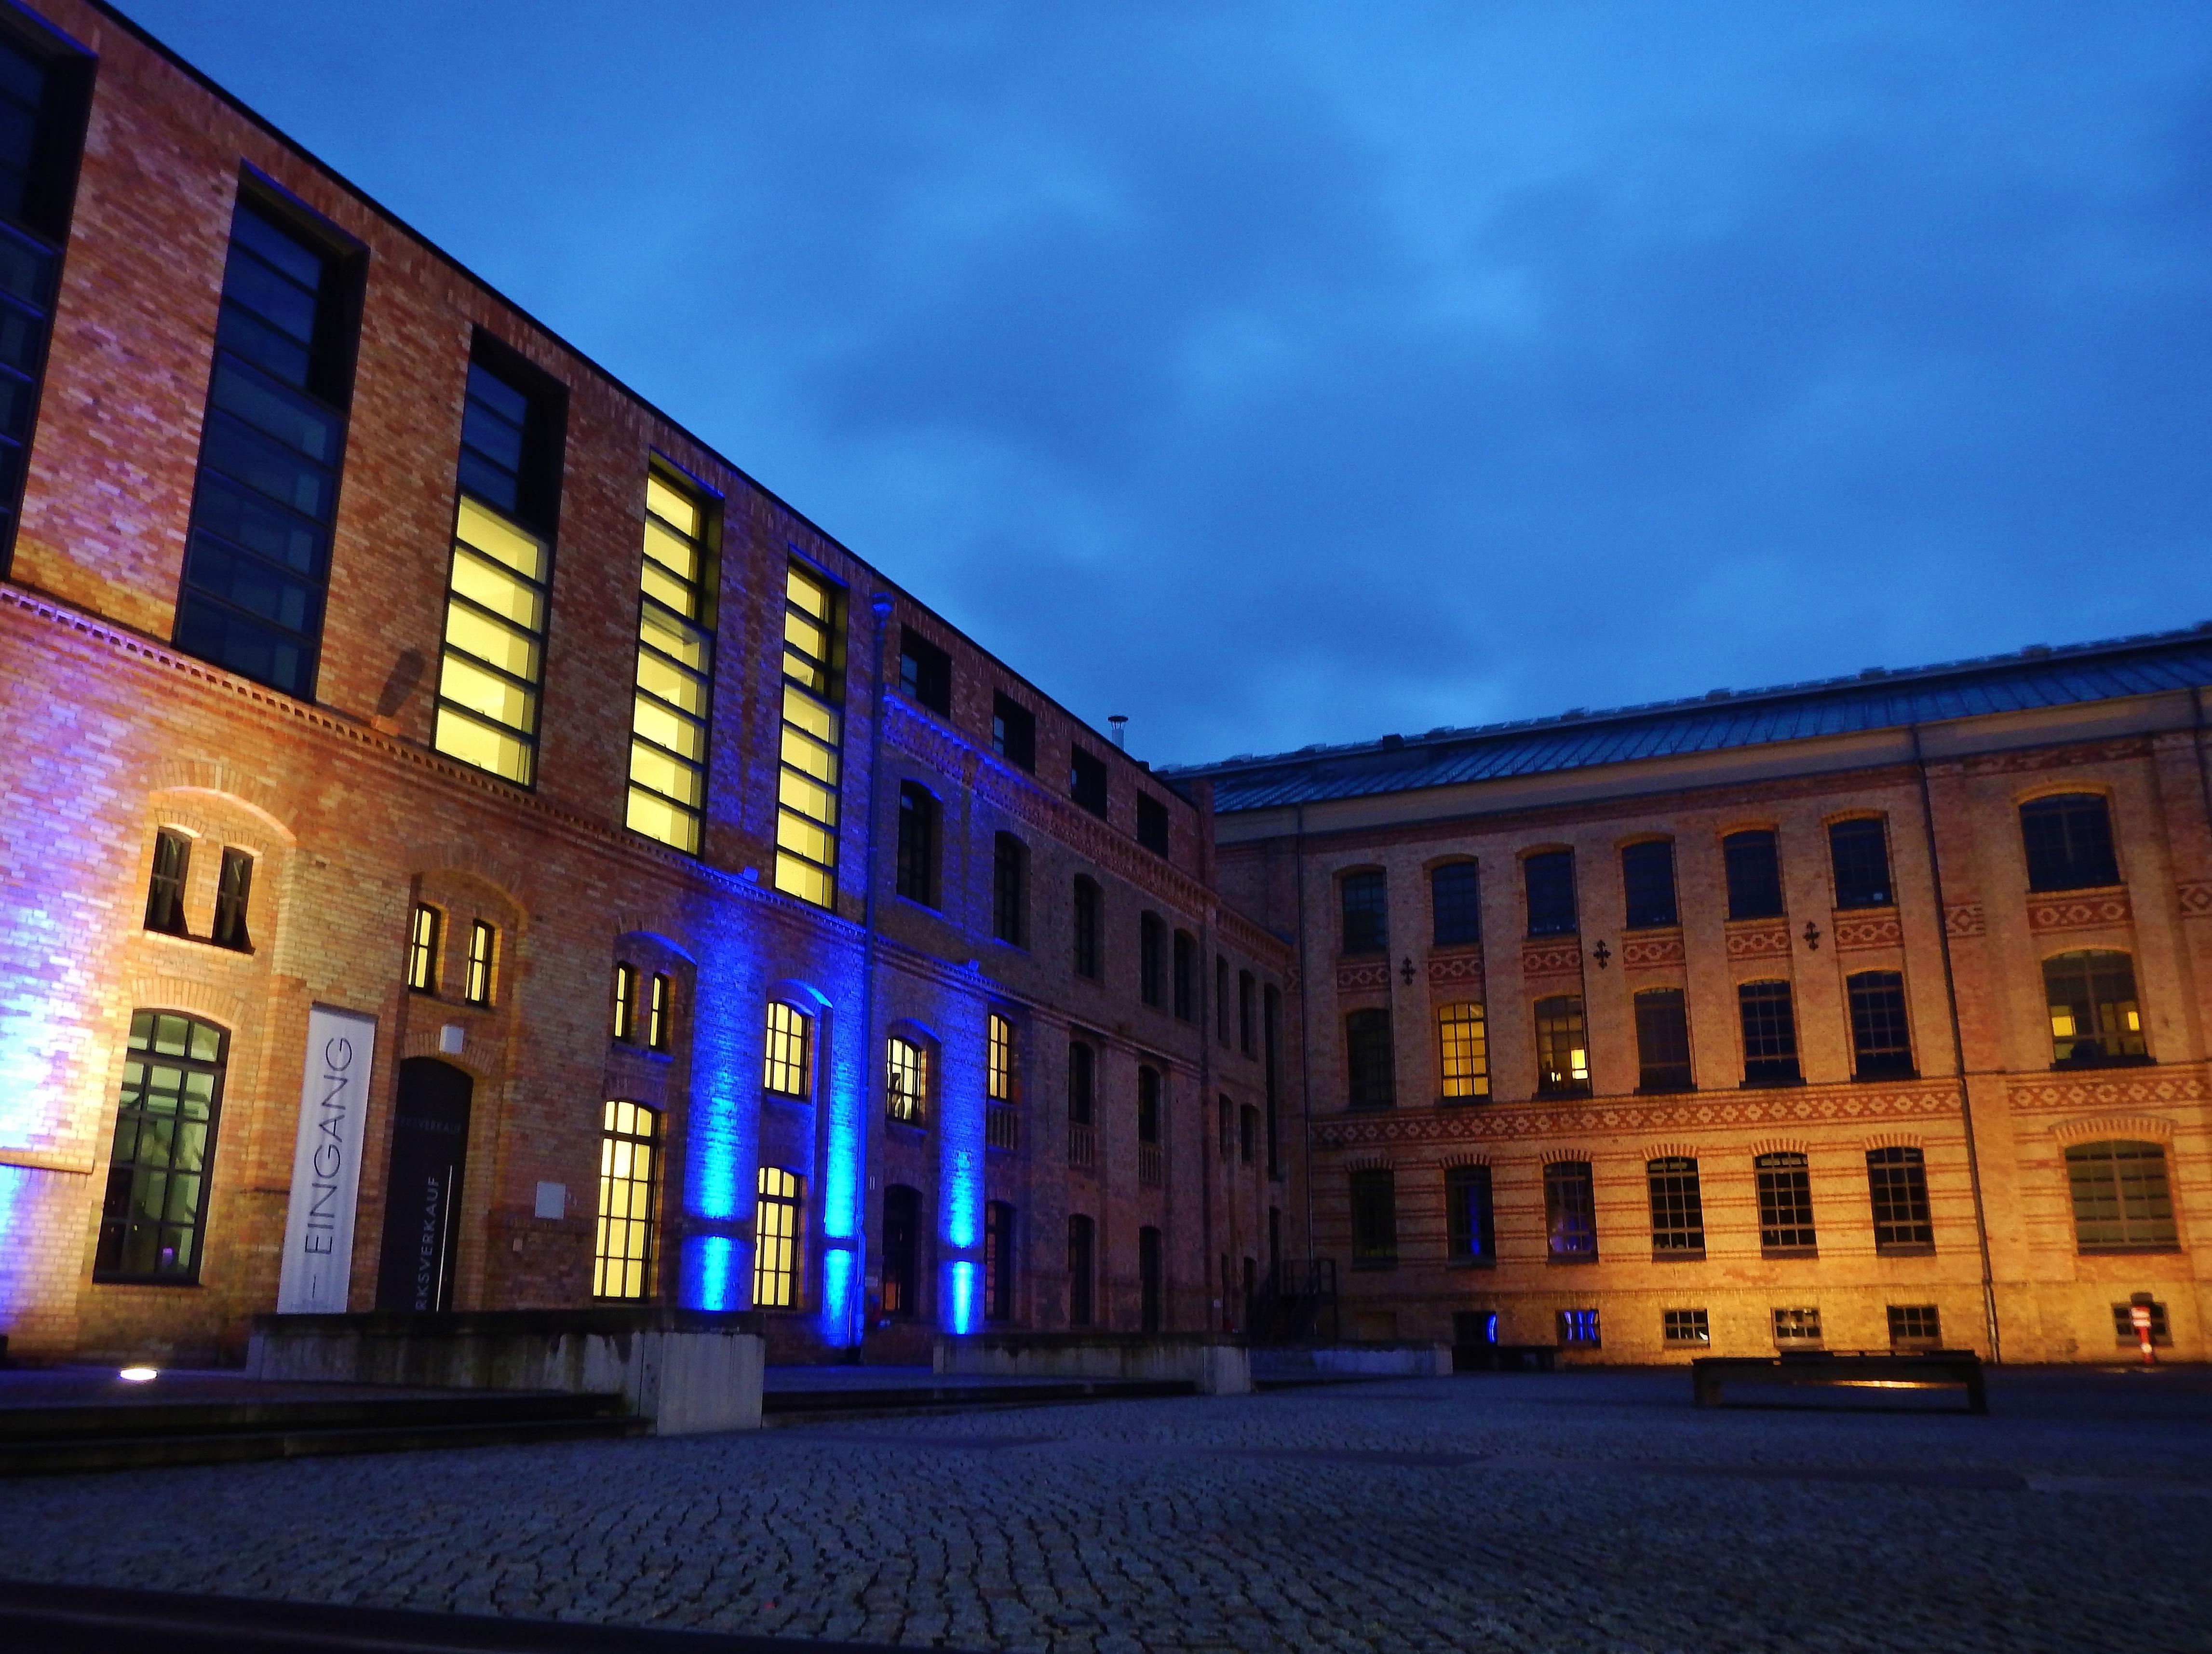 Kpm Königliche Porzellan Manufaktur Berlin Gmbh Berlin file:kpm königliche porzellan-manufaktur berlin gmbh - panoramio